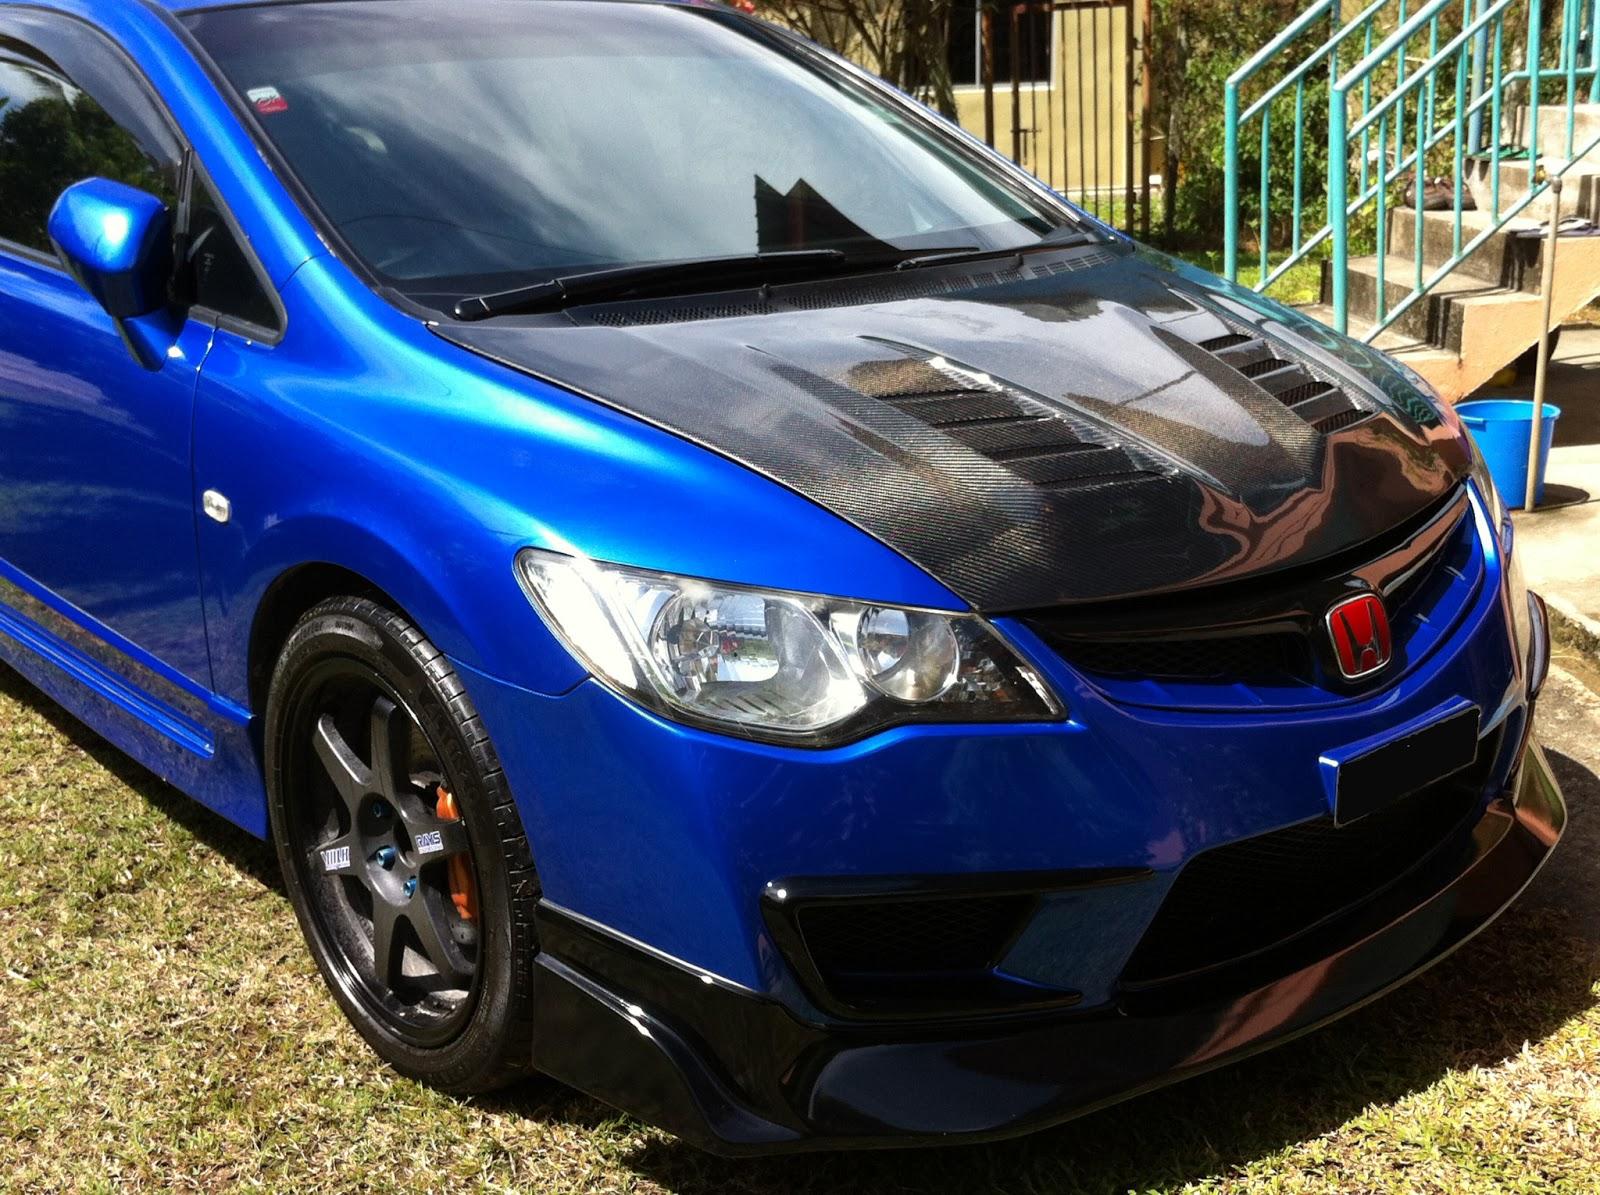 Car Rides: Honda Civic FD Blue J's Racing from Sabah ...